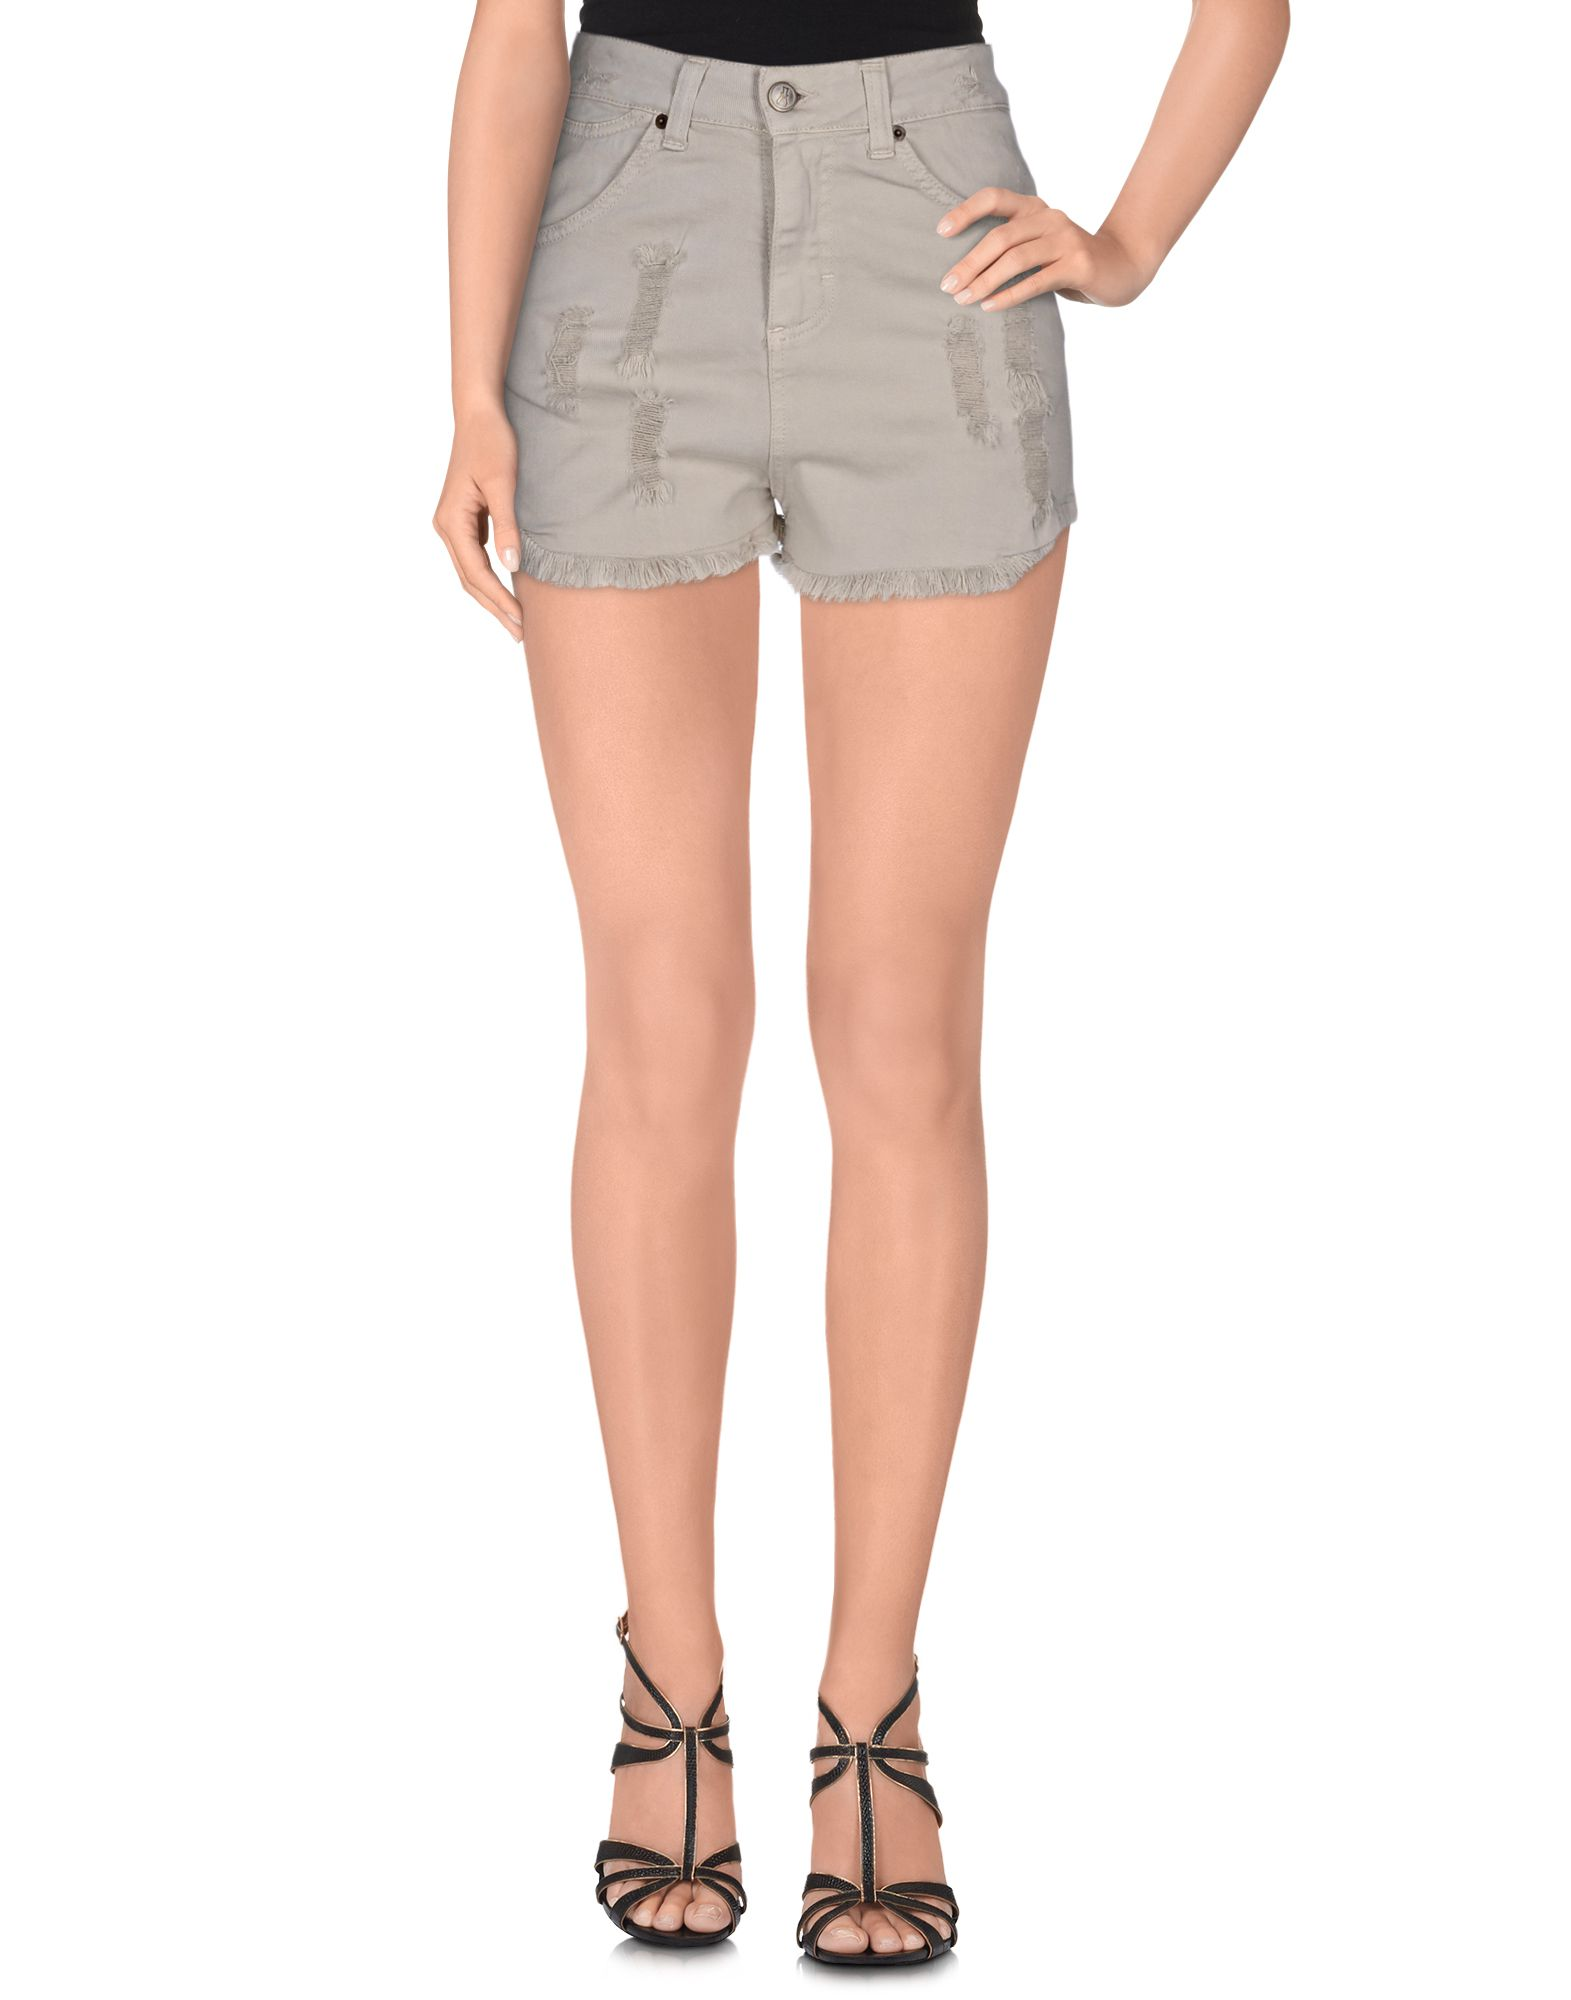 ANIYE BY Damen Shorts Farbe Grau Größe 4